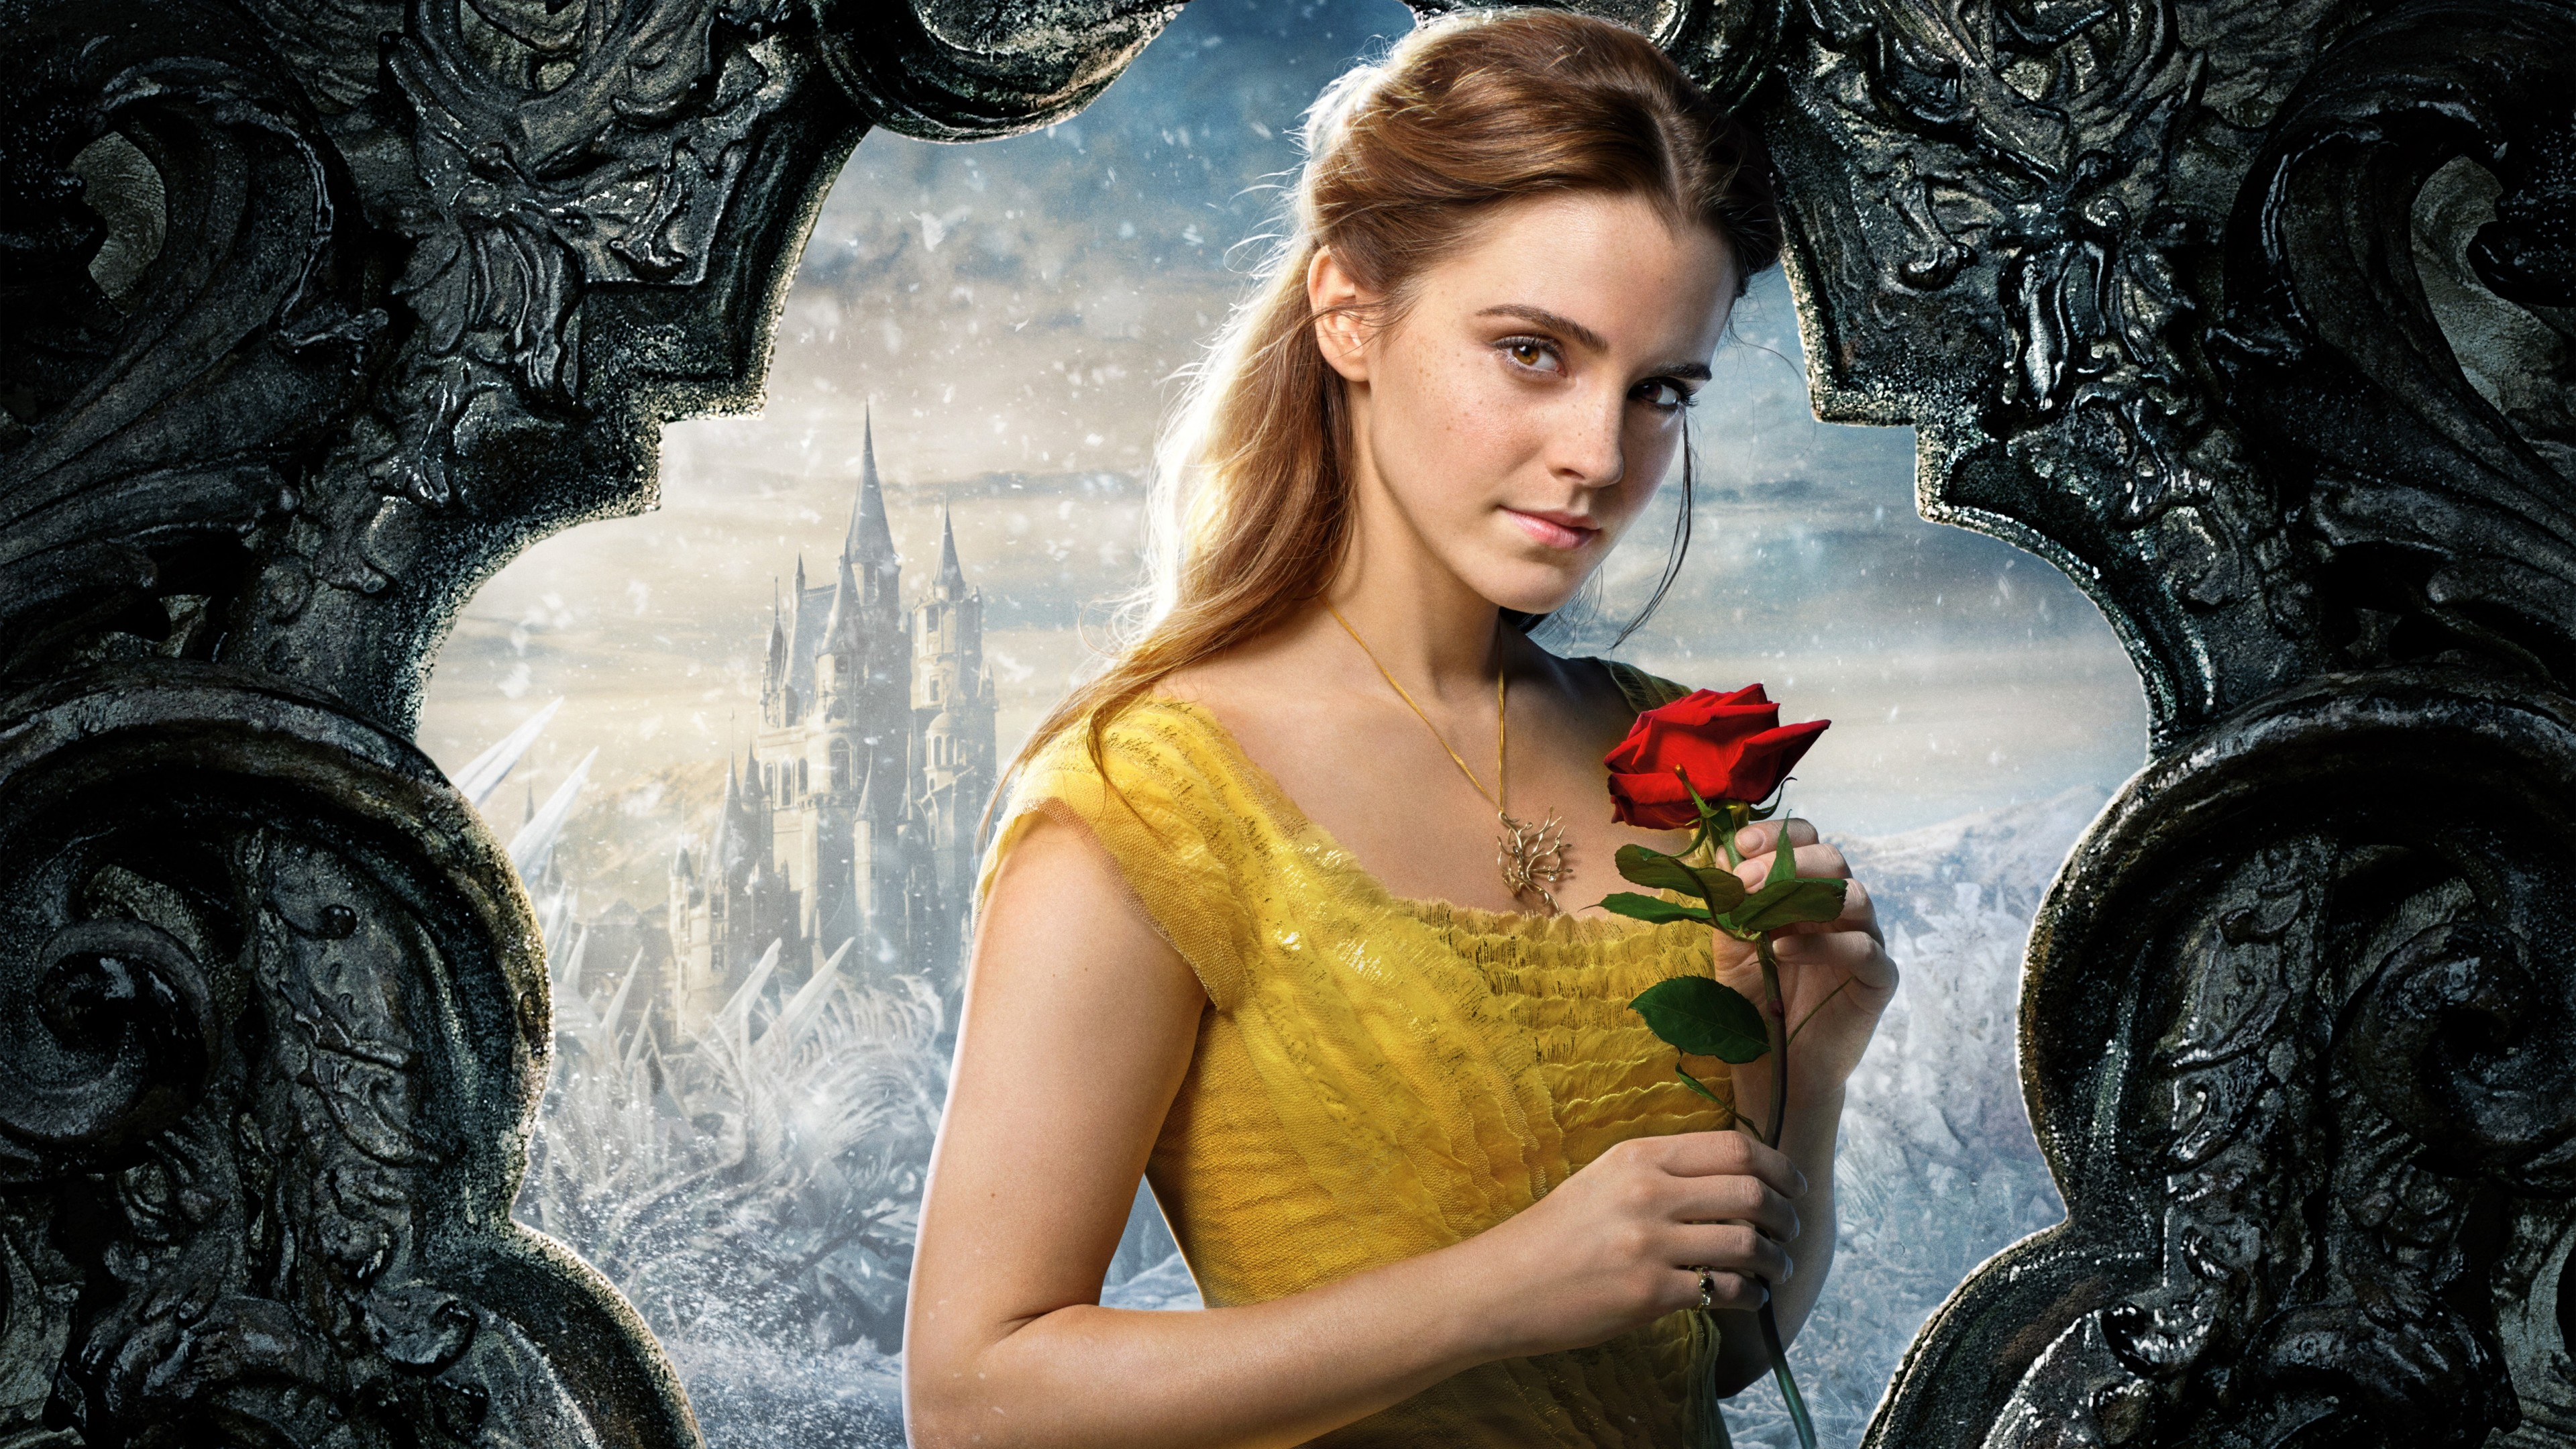 beauty and the beast emma watson 1536401765 - Beauty And The Beast Emma Watson - movies wallpapers, hd-wallpapers, beauty and the beast wallpapers, 5k wallpapers, 4k-wallpapers, 2017 movies wallpapers